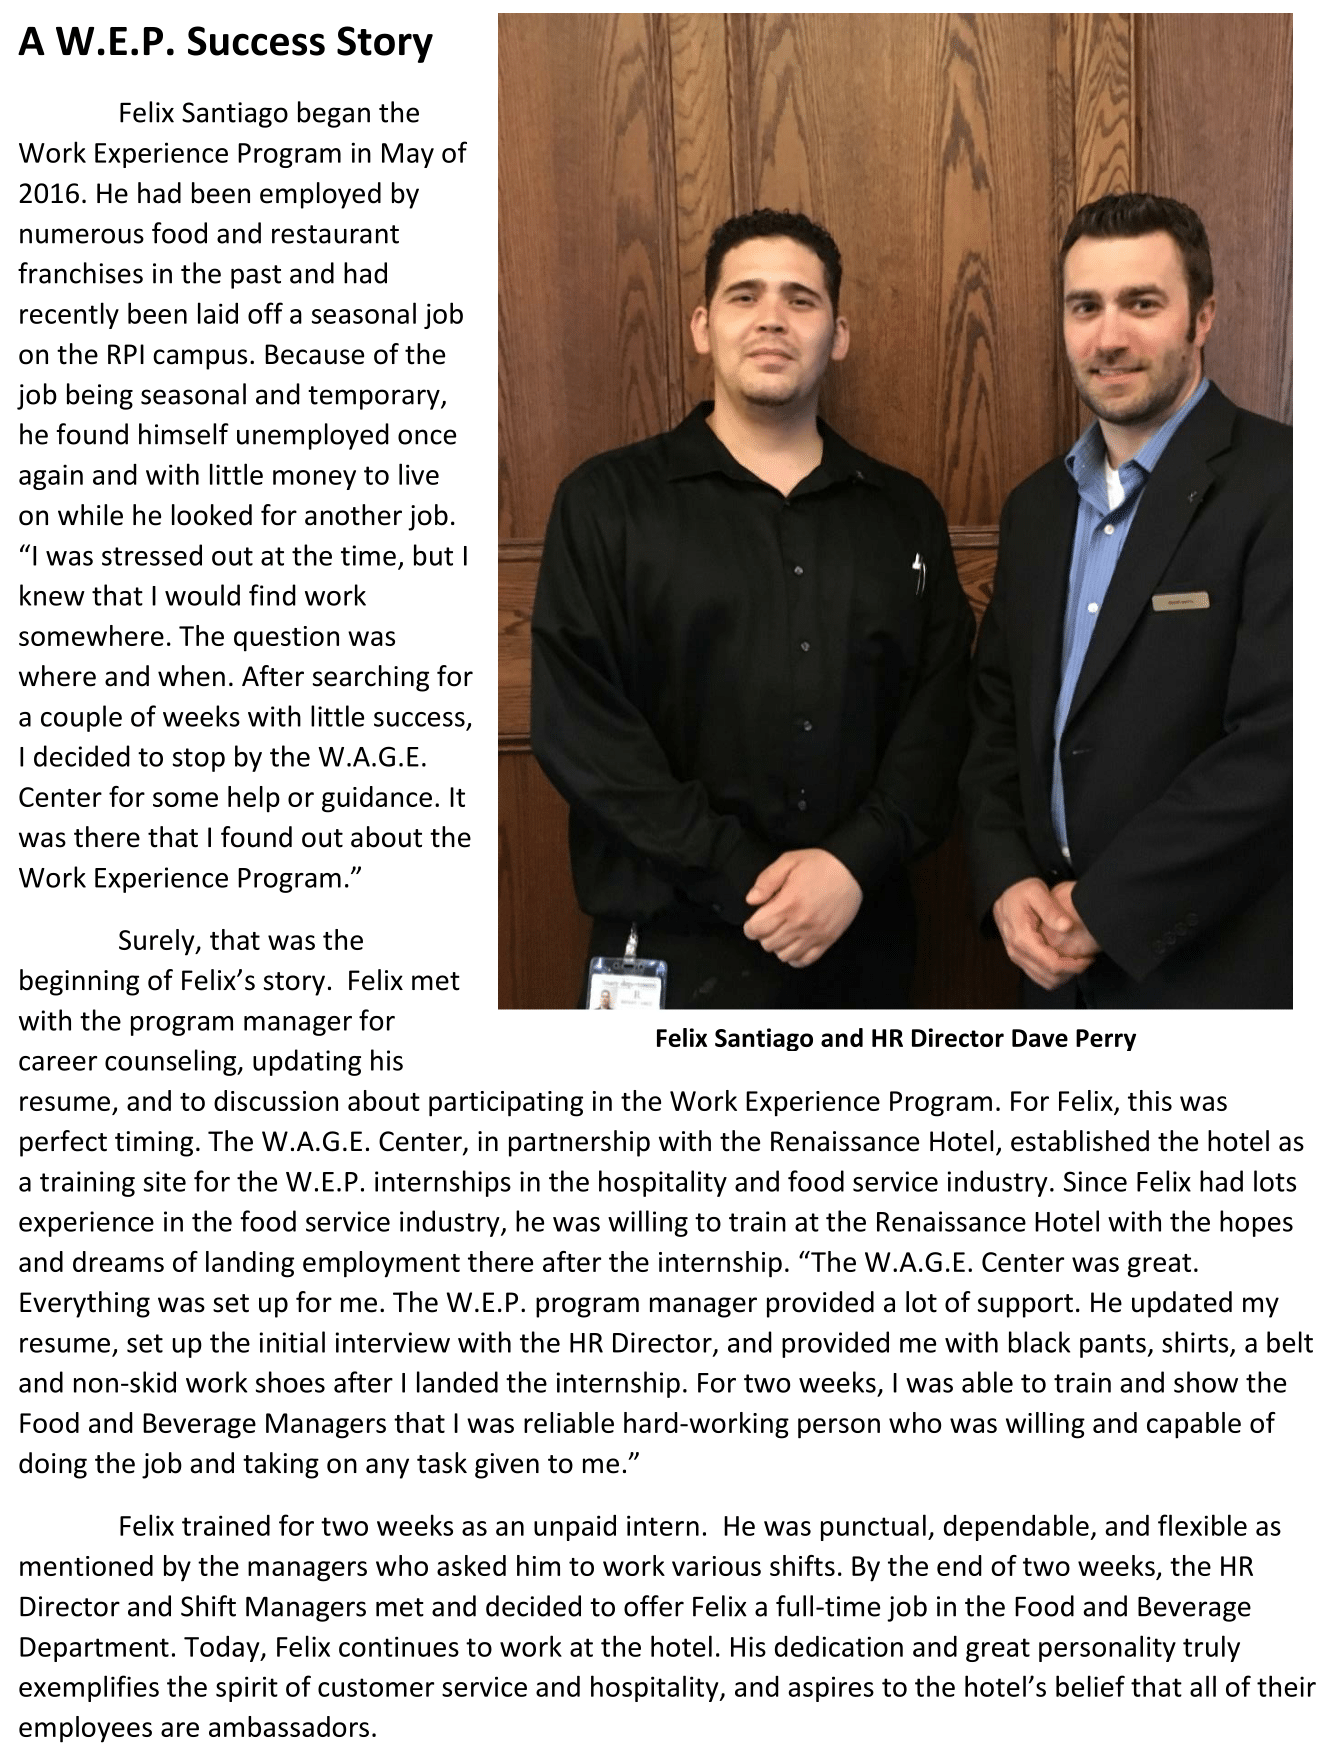 A WEP Success Story- Felix Santiago